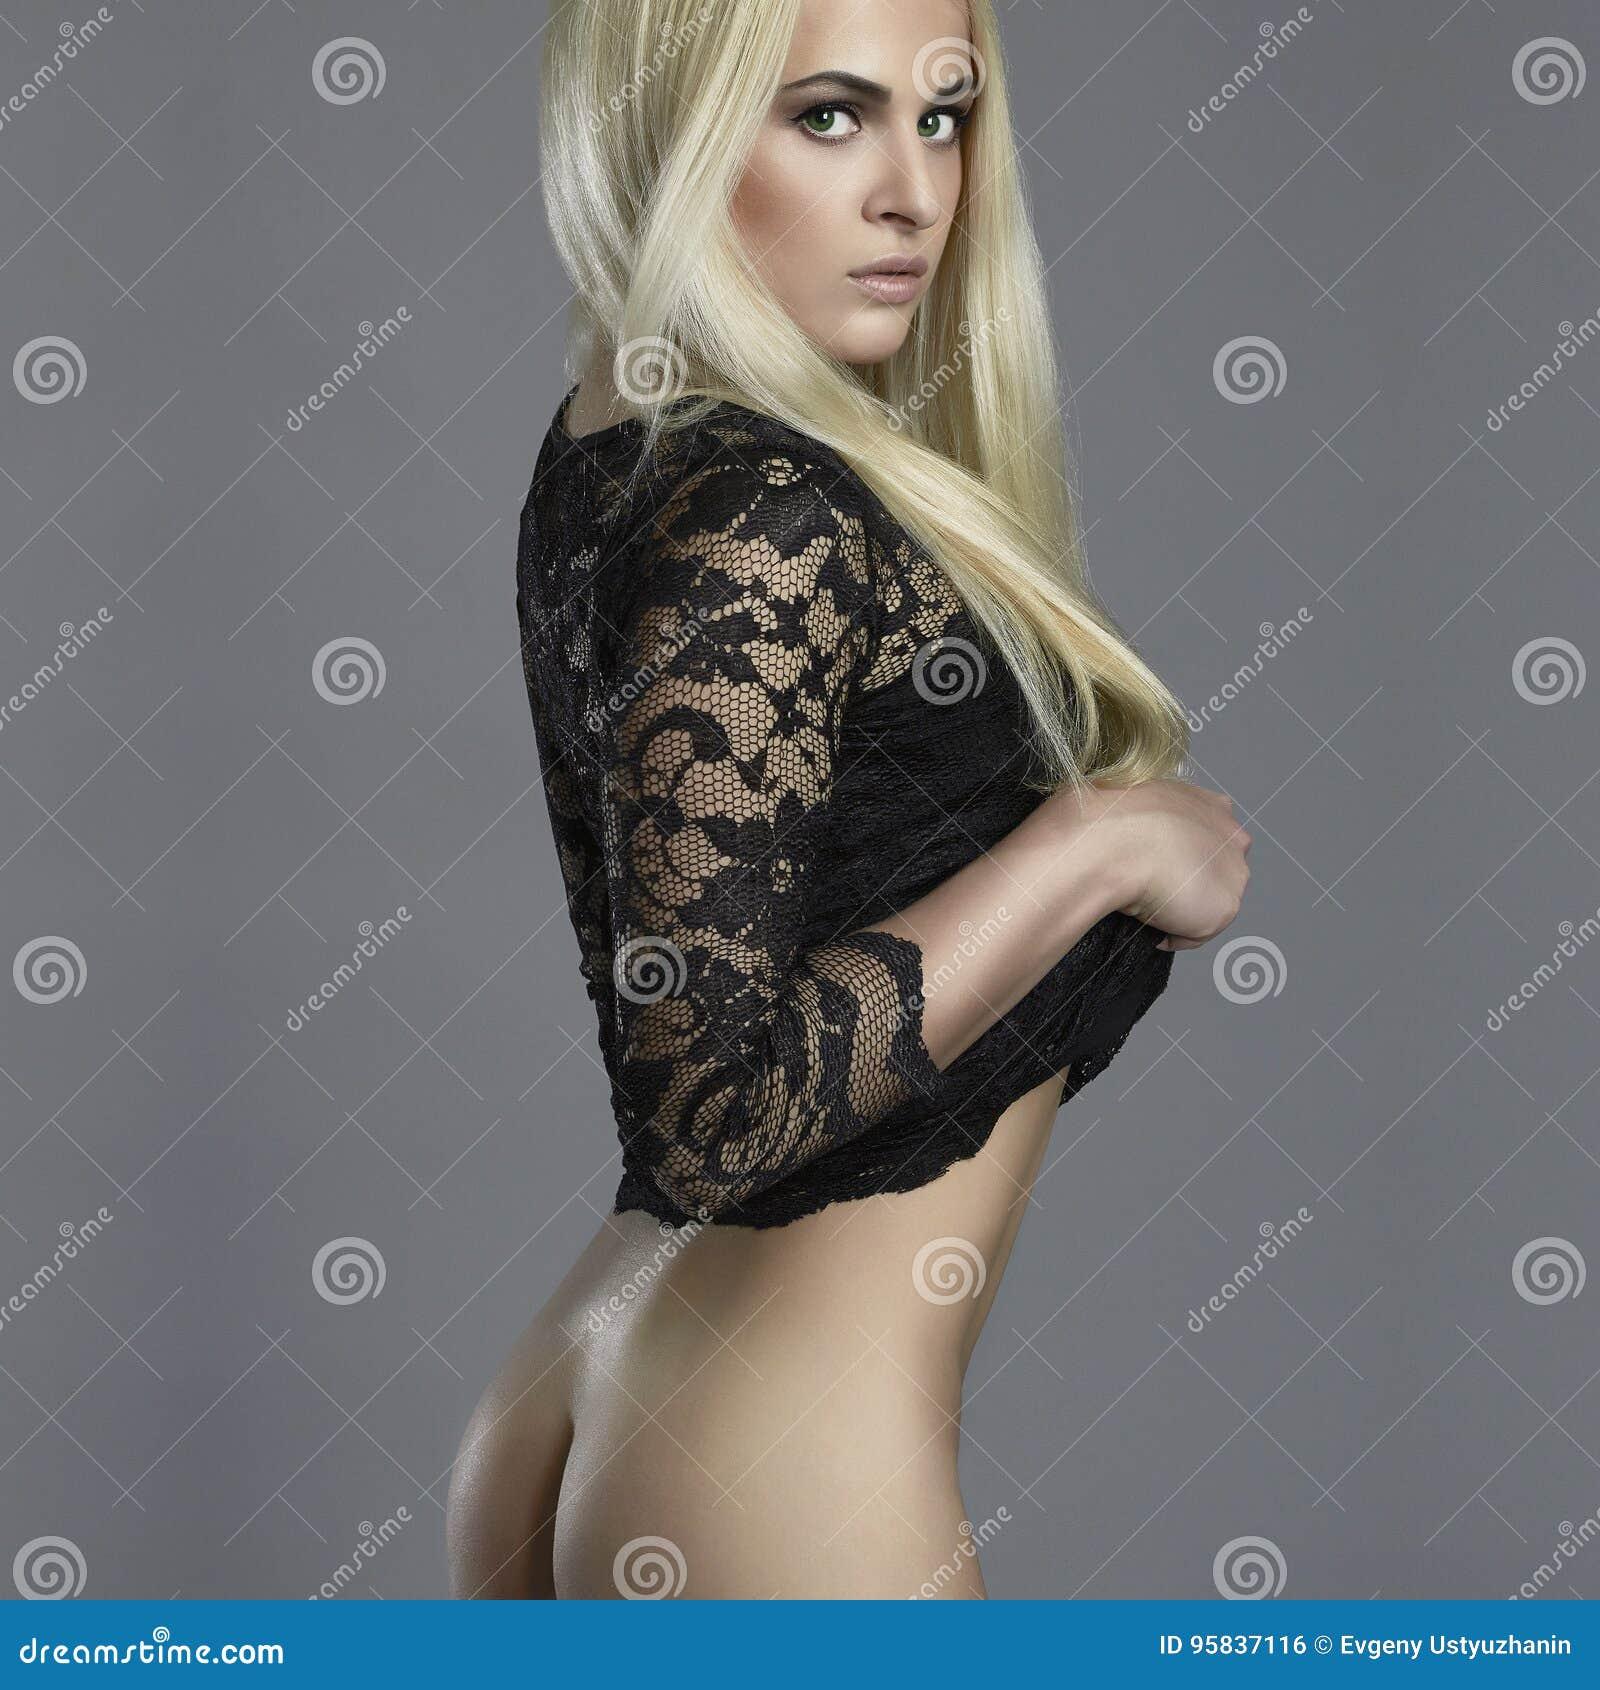 Nude Booty beautiful woman. nude booty girl stock photo - image of body